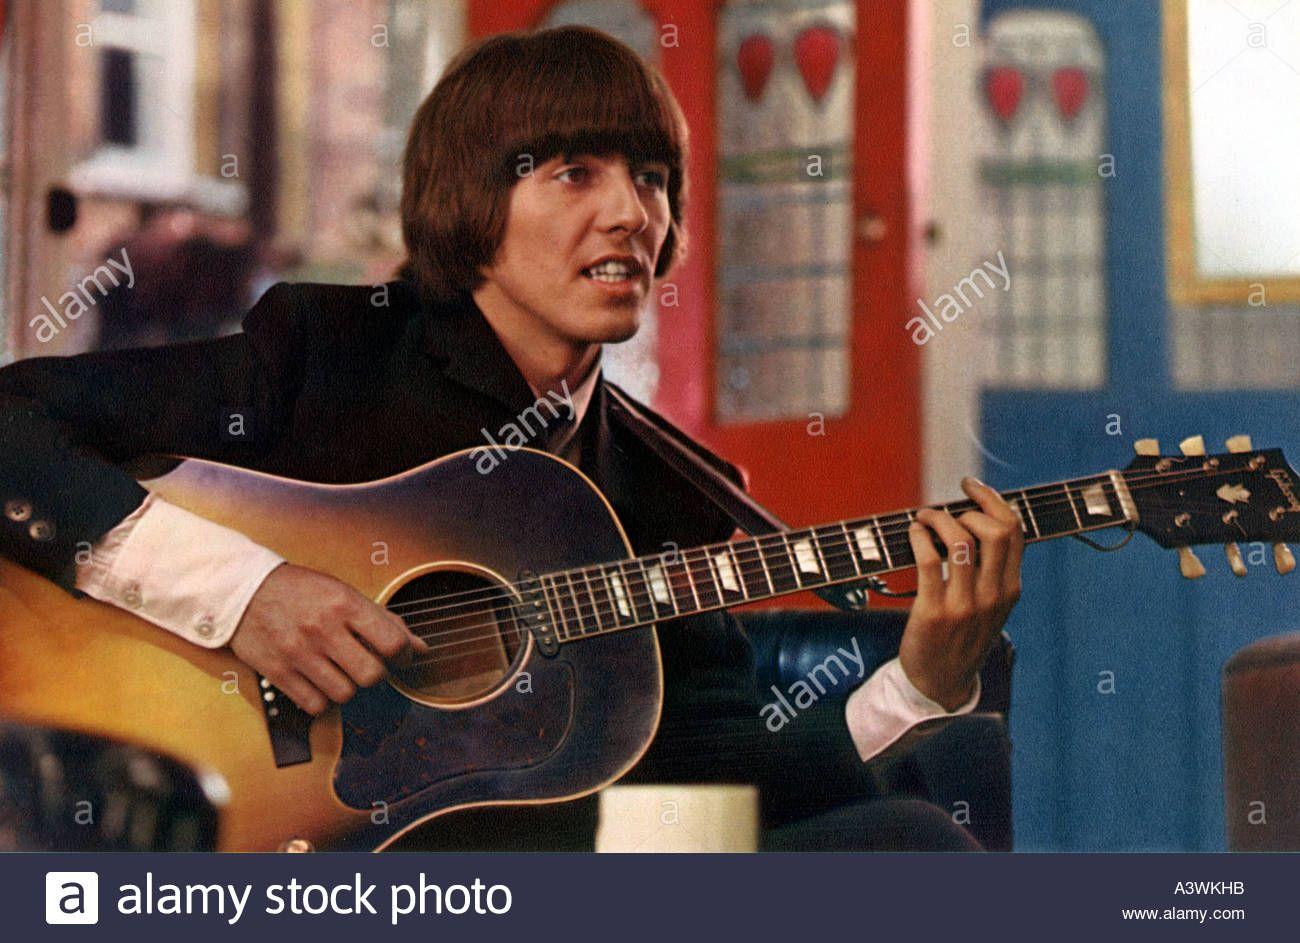 Tommy Emmanuel Cgp Official Website Tommy Emmanuel Famous Guitarists Guitar